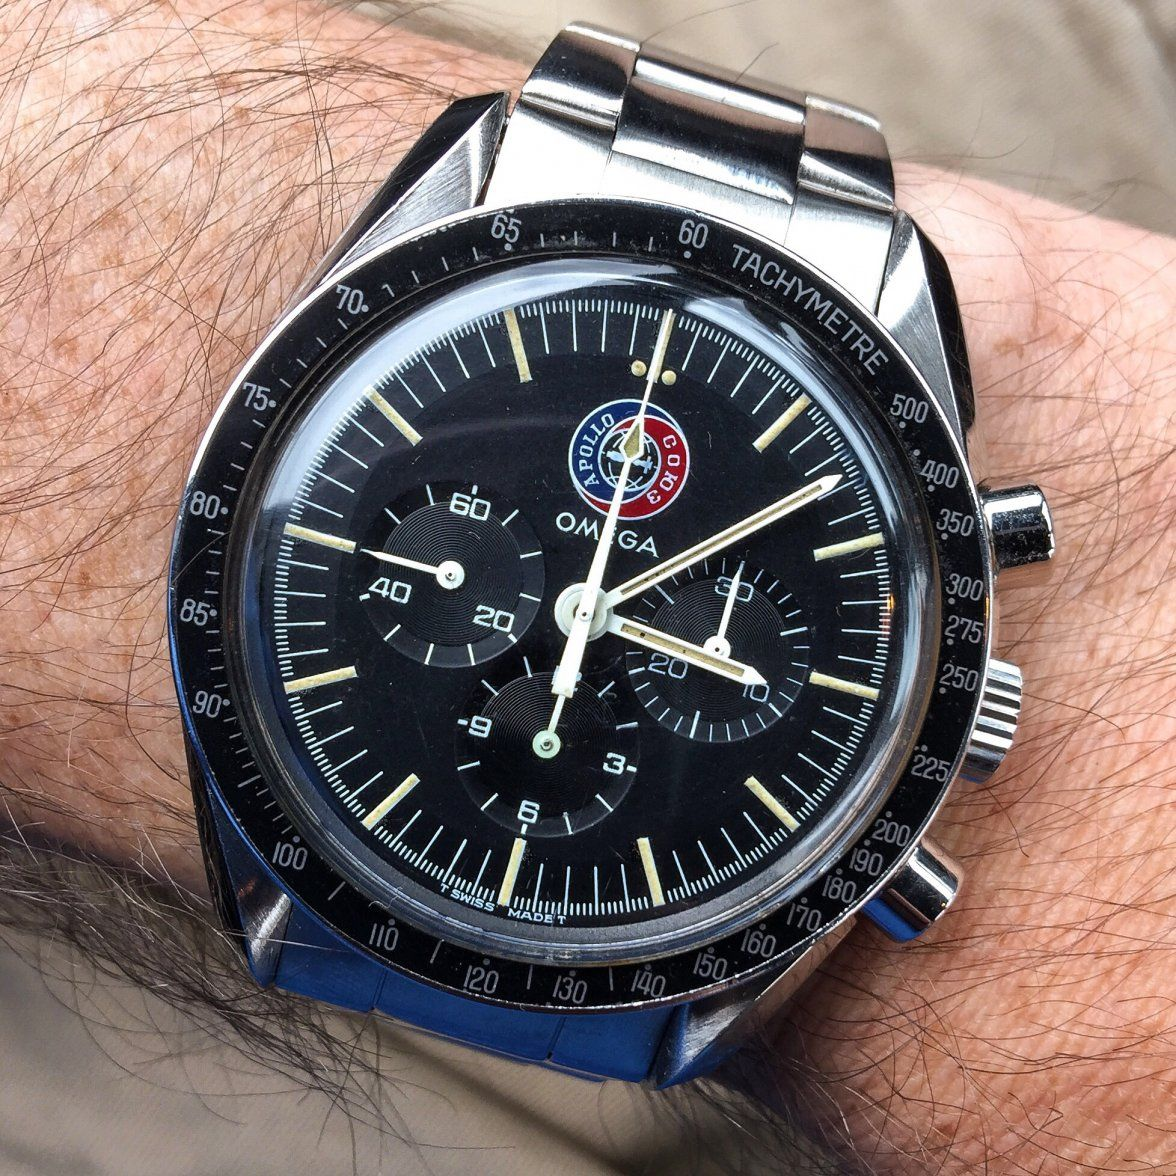 Rare Vintage OMEGA Speedmaster Pro Apollo-Soyuz LE Moonwatch Circa 1976 - http://omegaforums.net